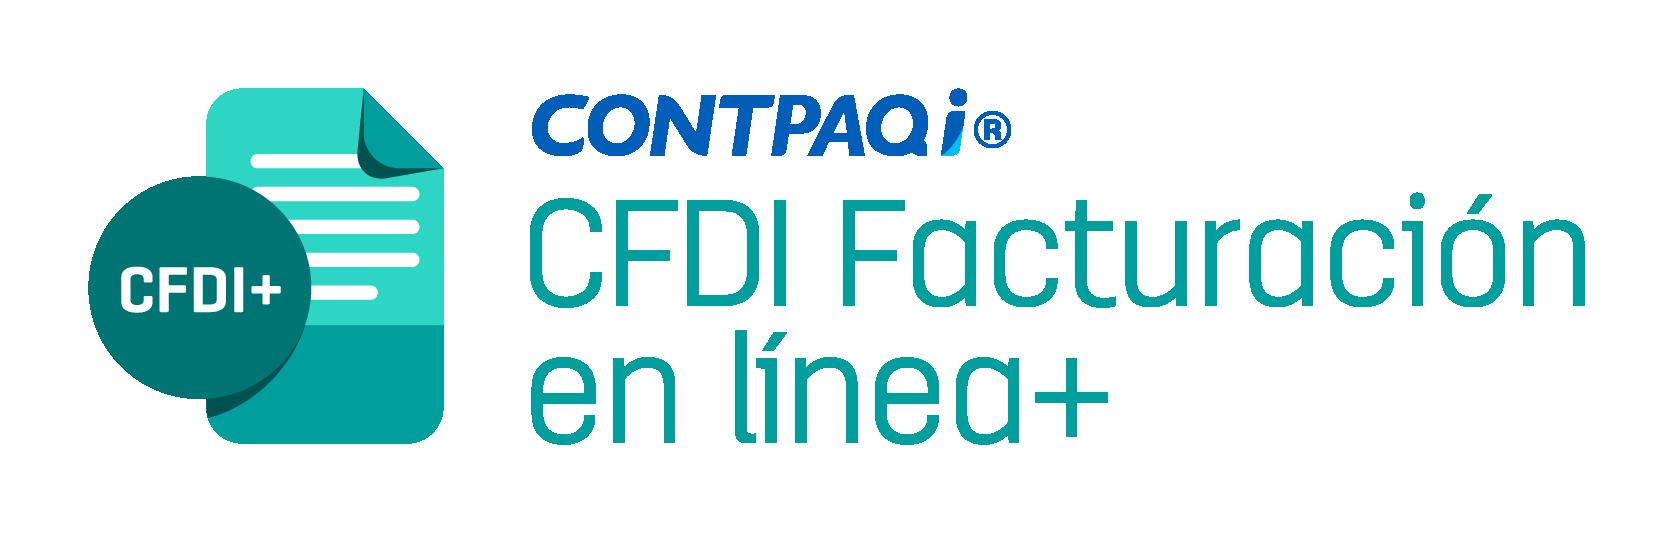 CONTPAQi_facturación el línea